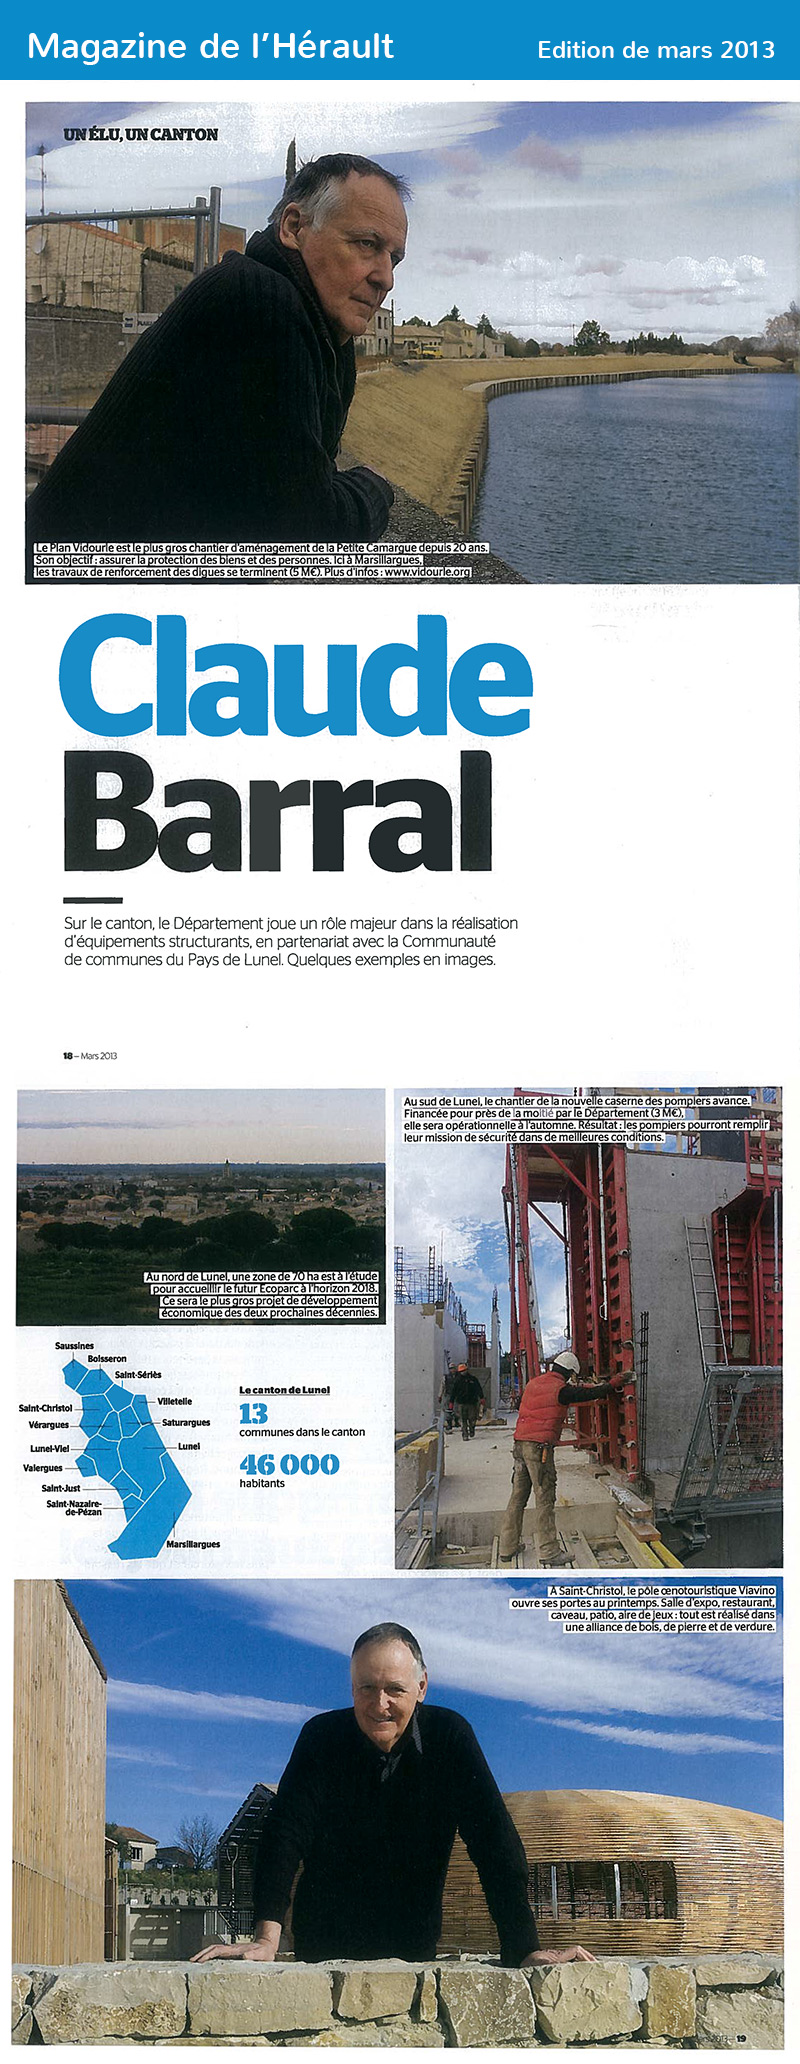 Magazine de l'Hérault – Mars 2013